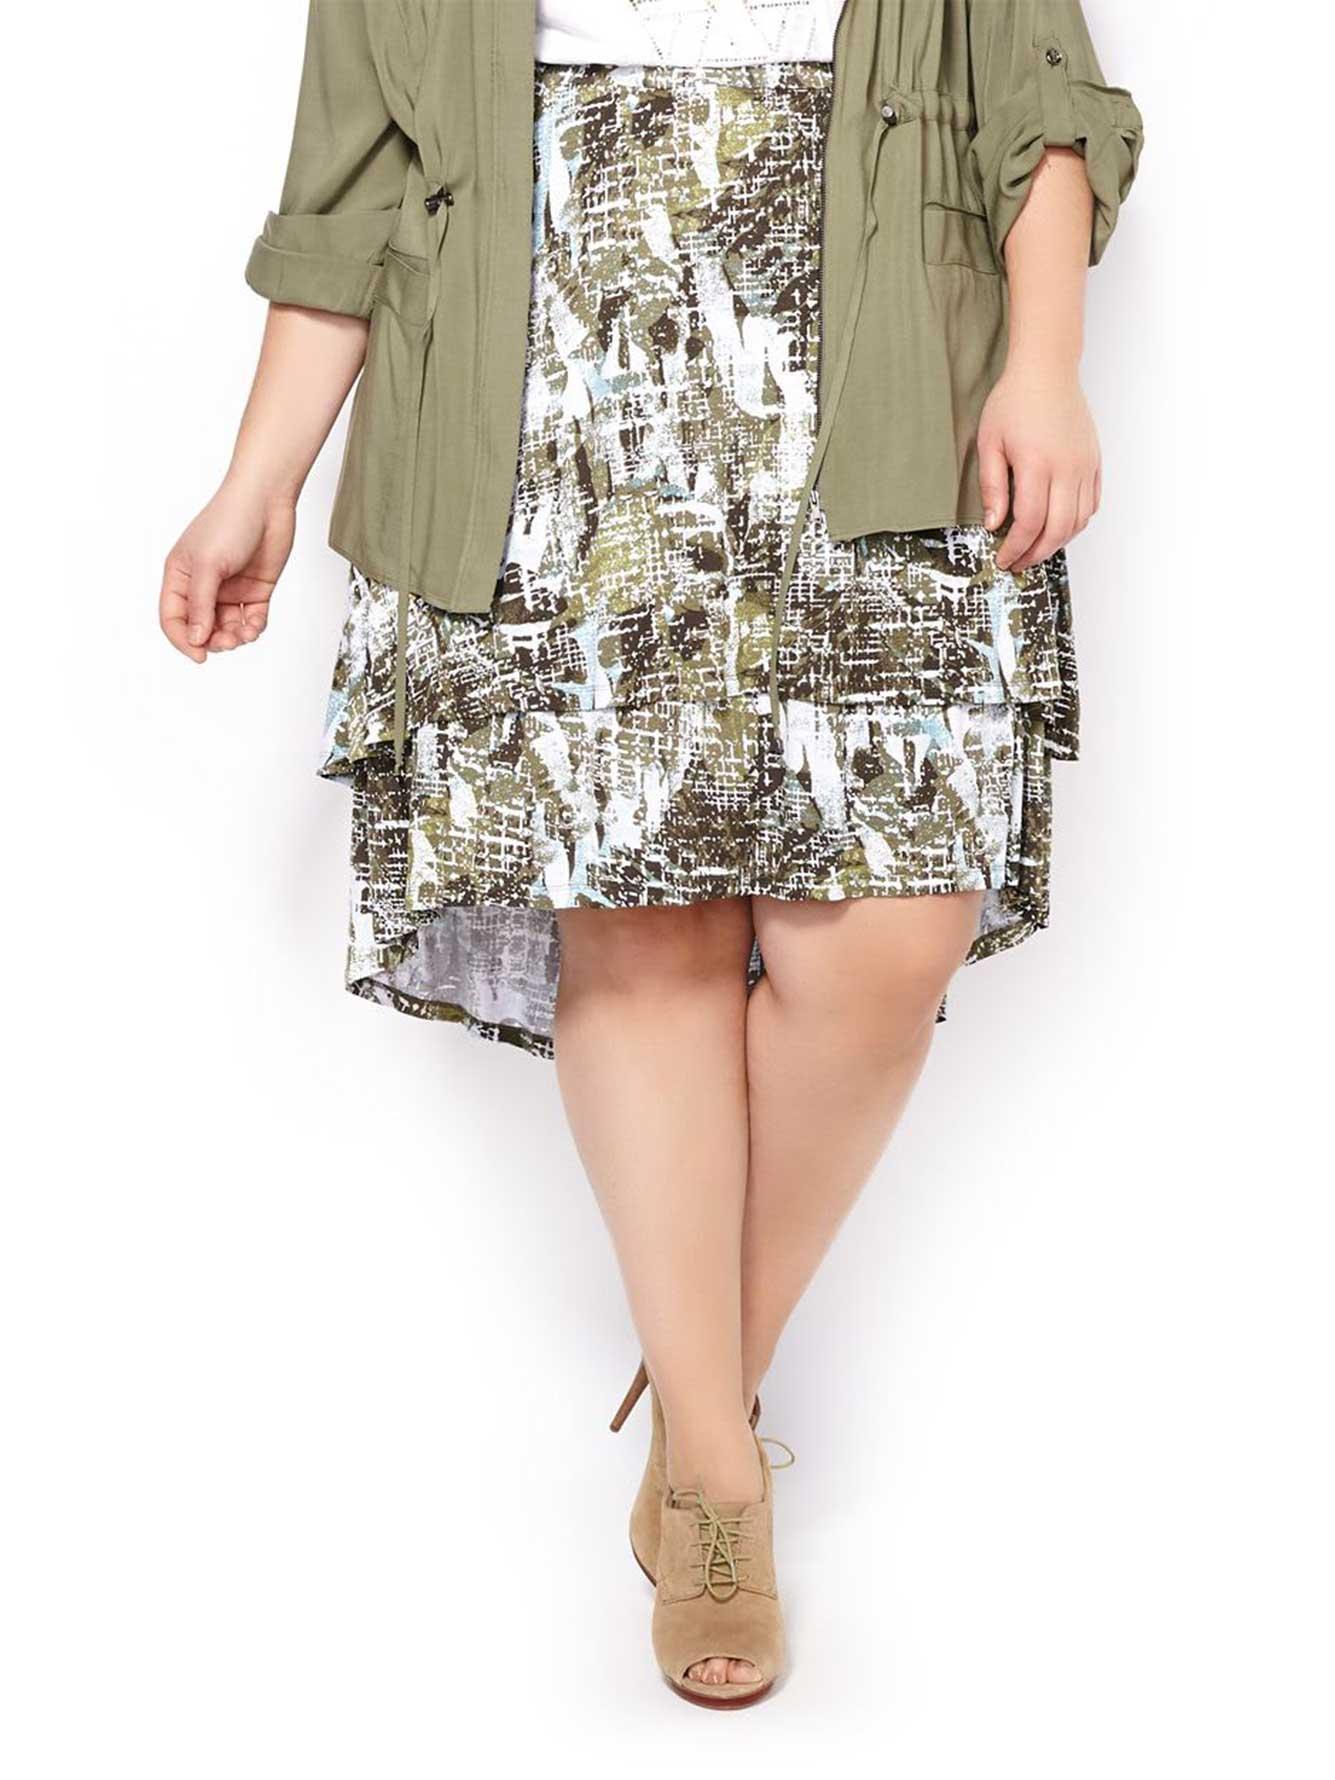 b4e8aff3dc7 Printed Layered Skirt